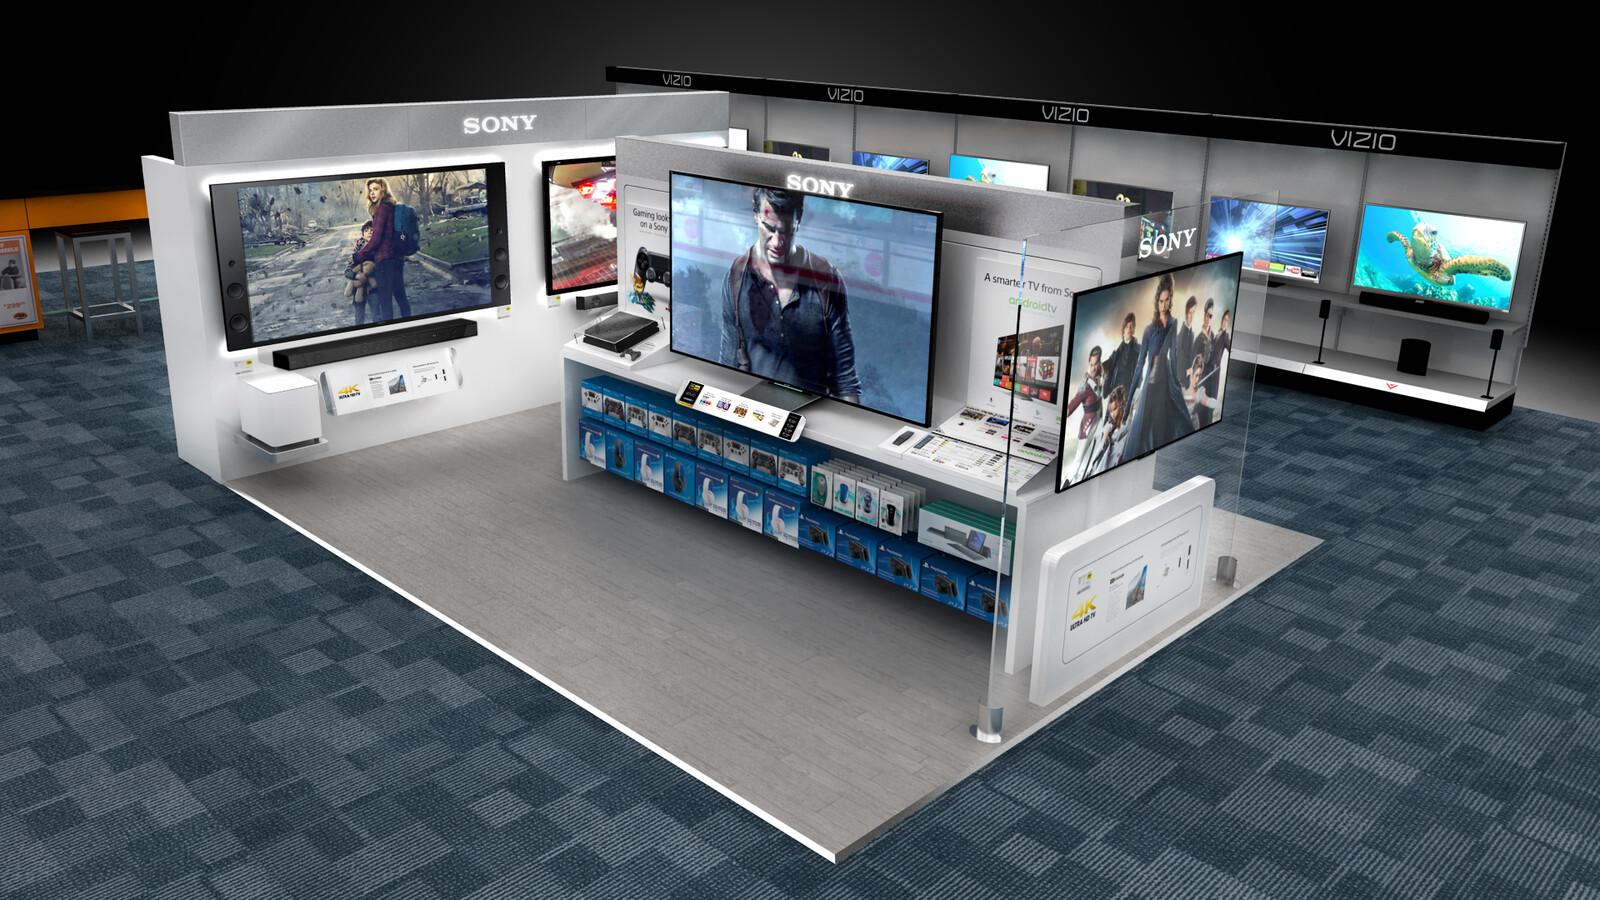 Sony Best Buy Environment